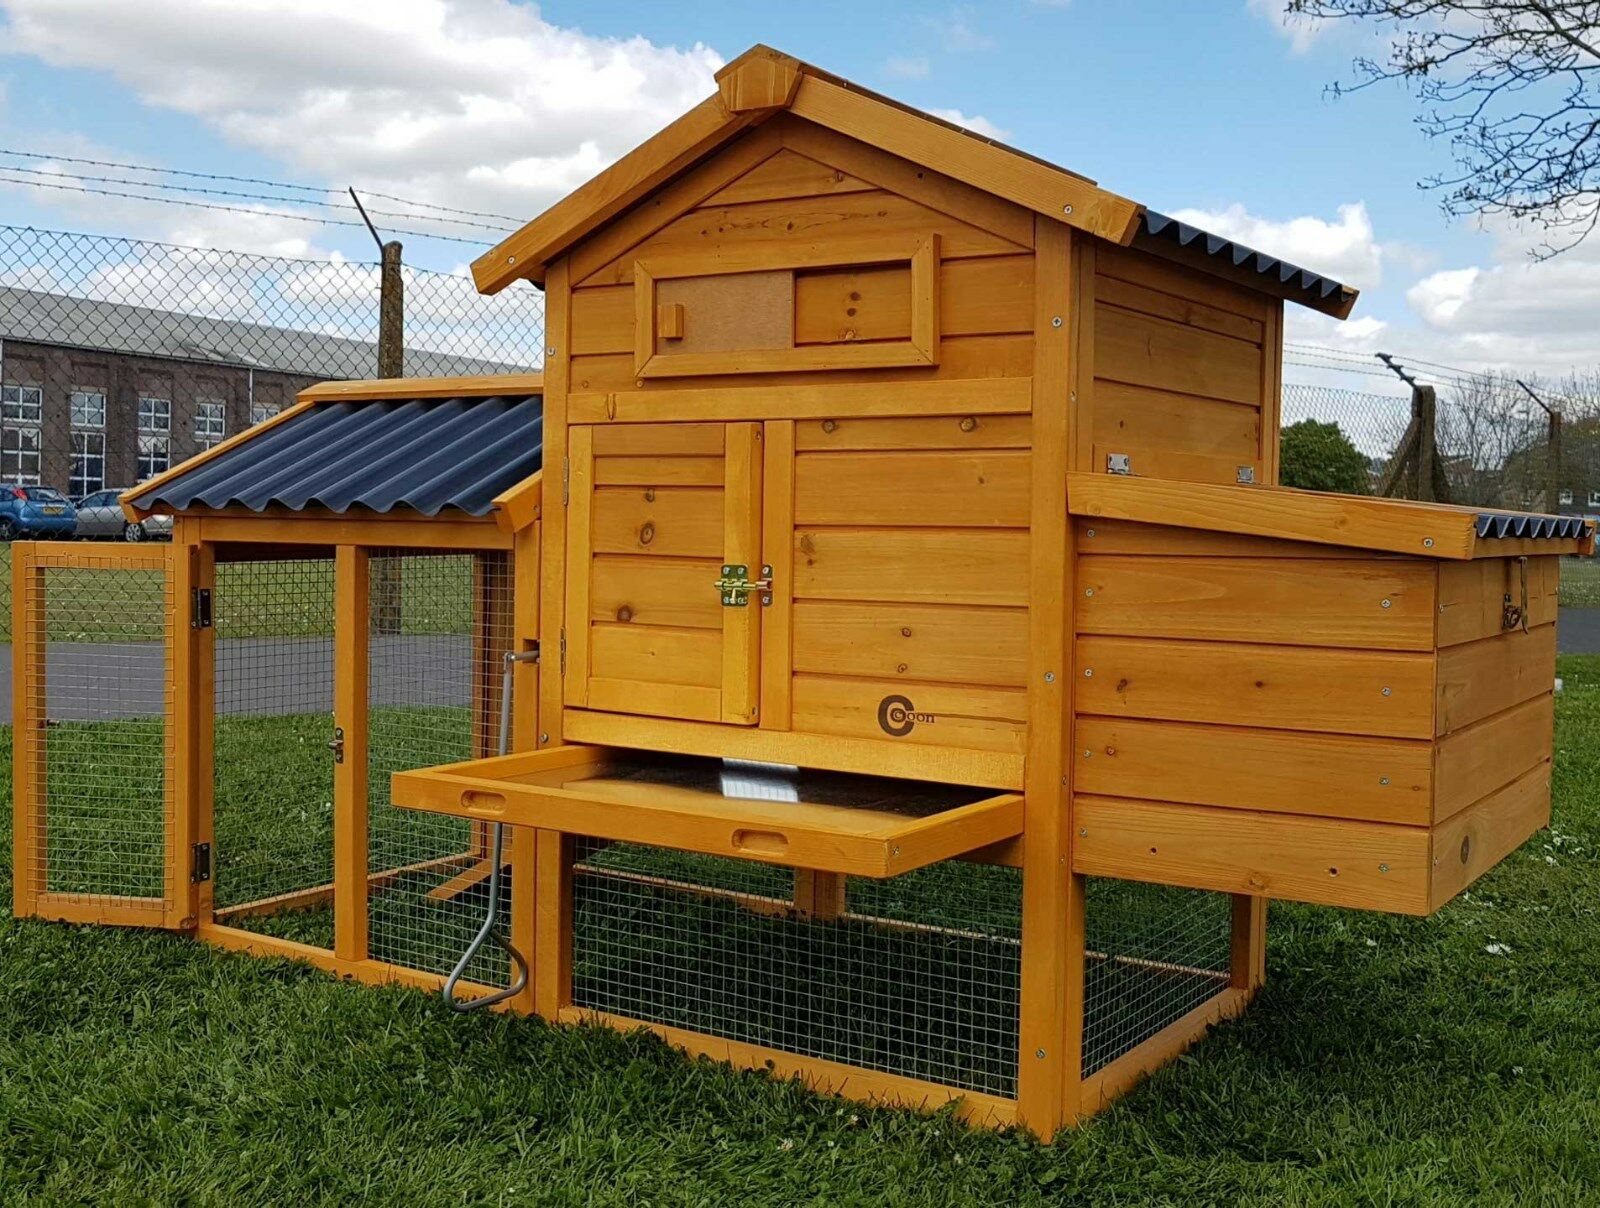 Large chicken coop rabbit hutch my chicken coop for Duck hutch plans